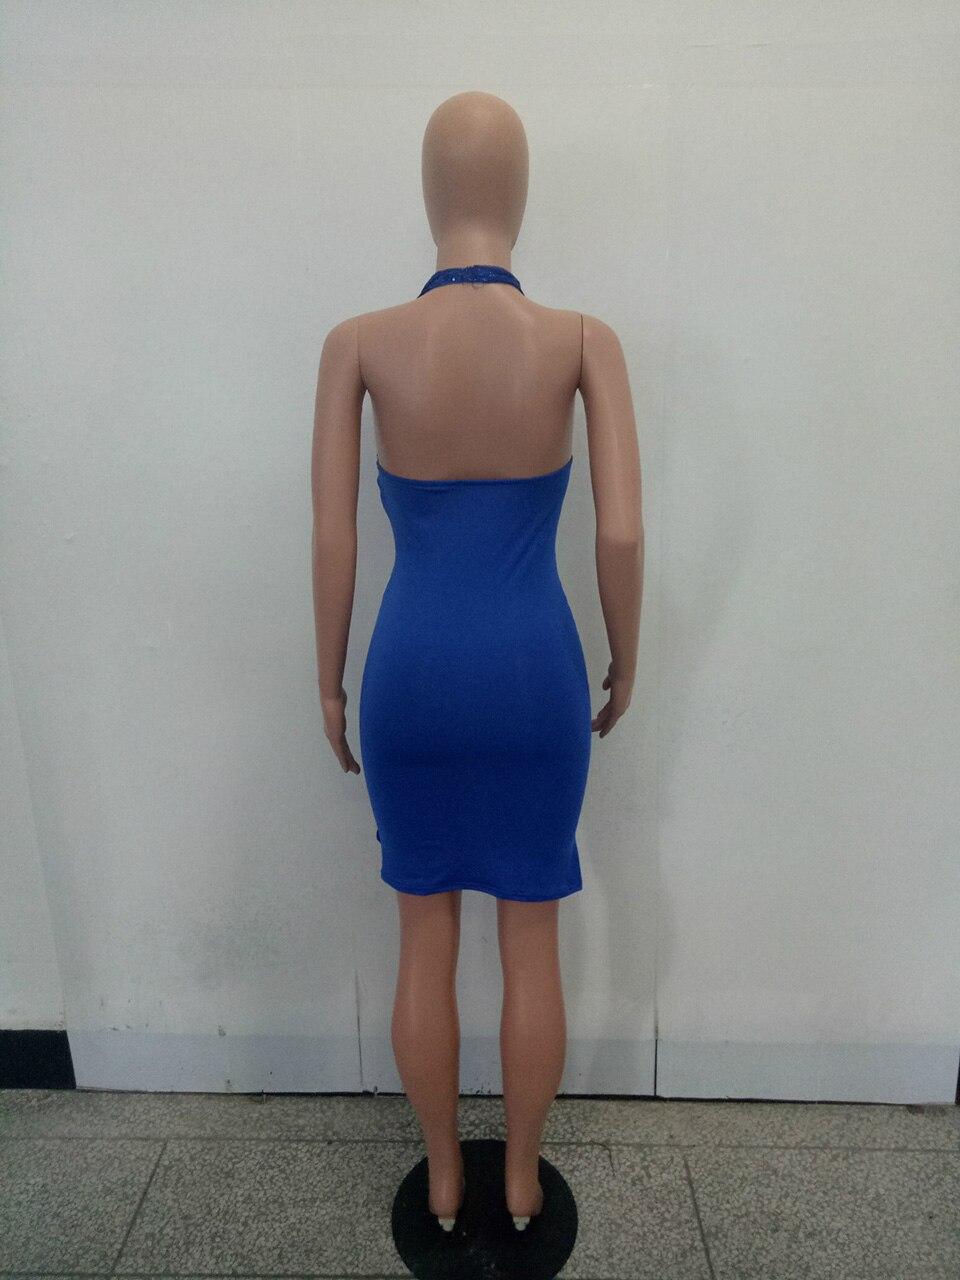 b2f0050c7 € 21.74  Hongmiao Mujeres Partido vestido azul sequined backless ver a  través de malla bodycon Vestido corto transparente lujo Club mini sundress  ...